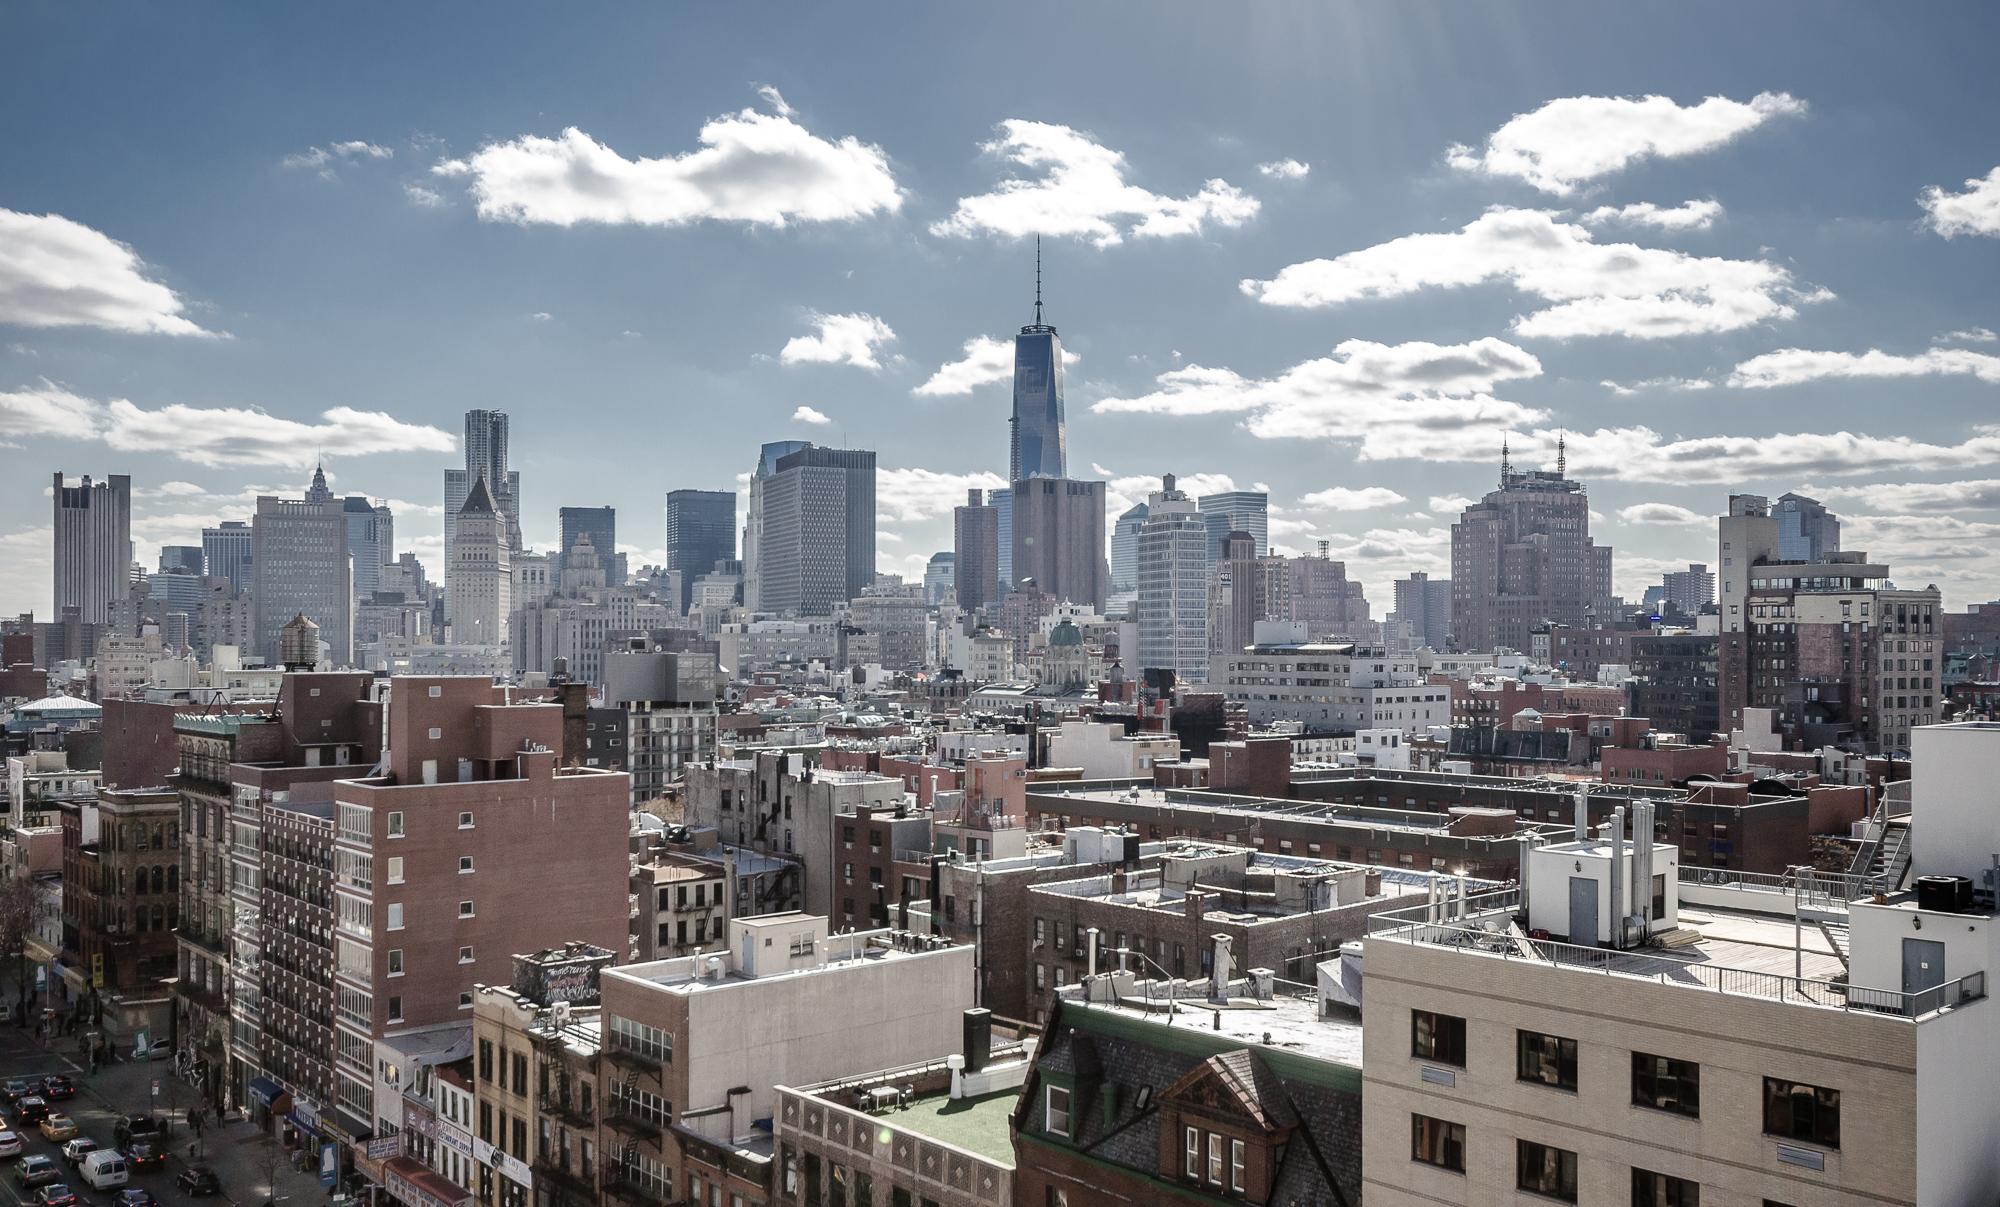 Mitchell Lama Waiting List 2020.City Overhauls Mitchell Lama Middle Income Housing Program